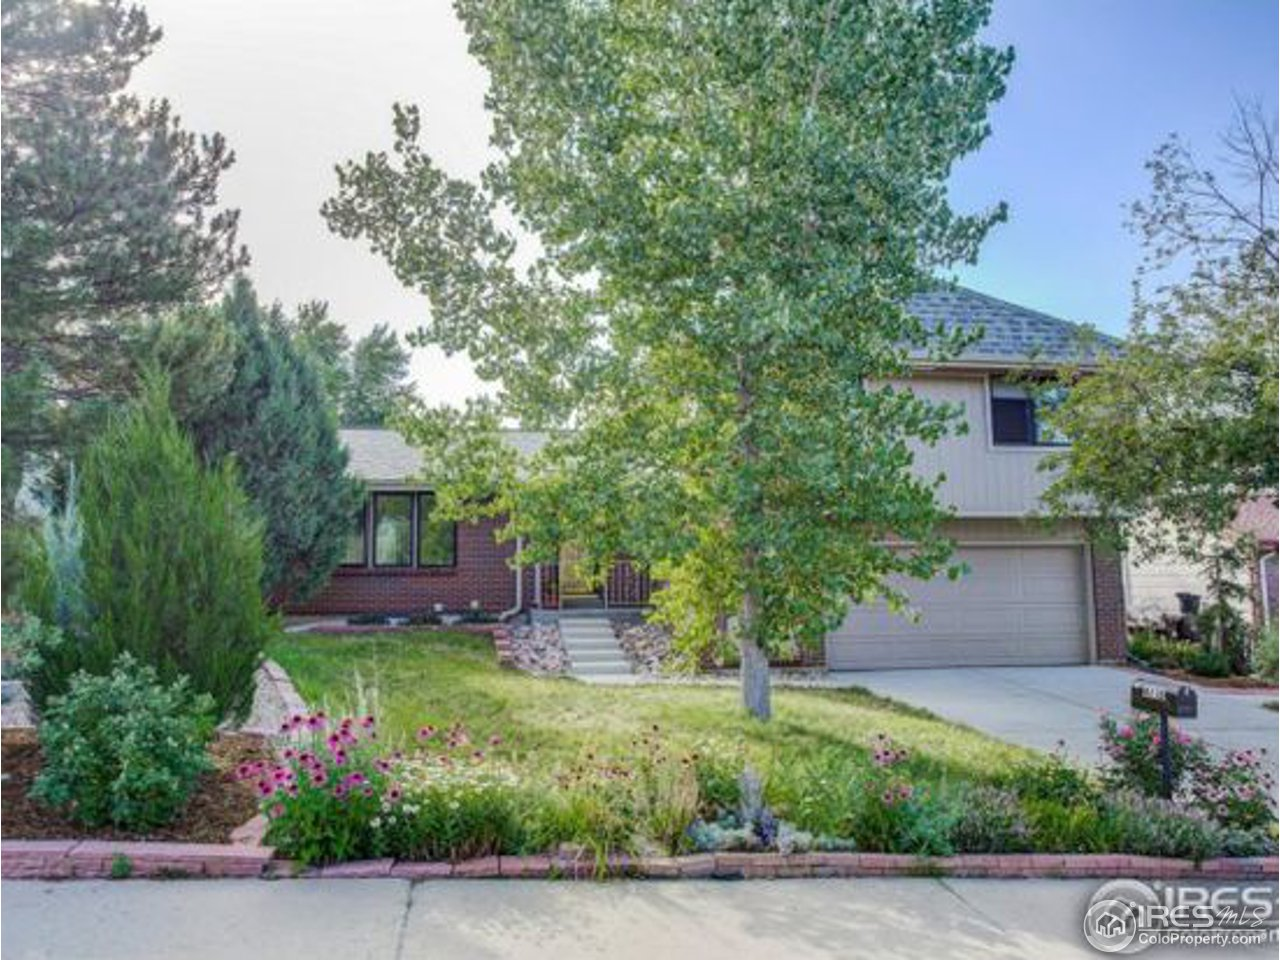 4718 Jameston St, Boulder CO 80301